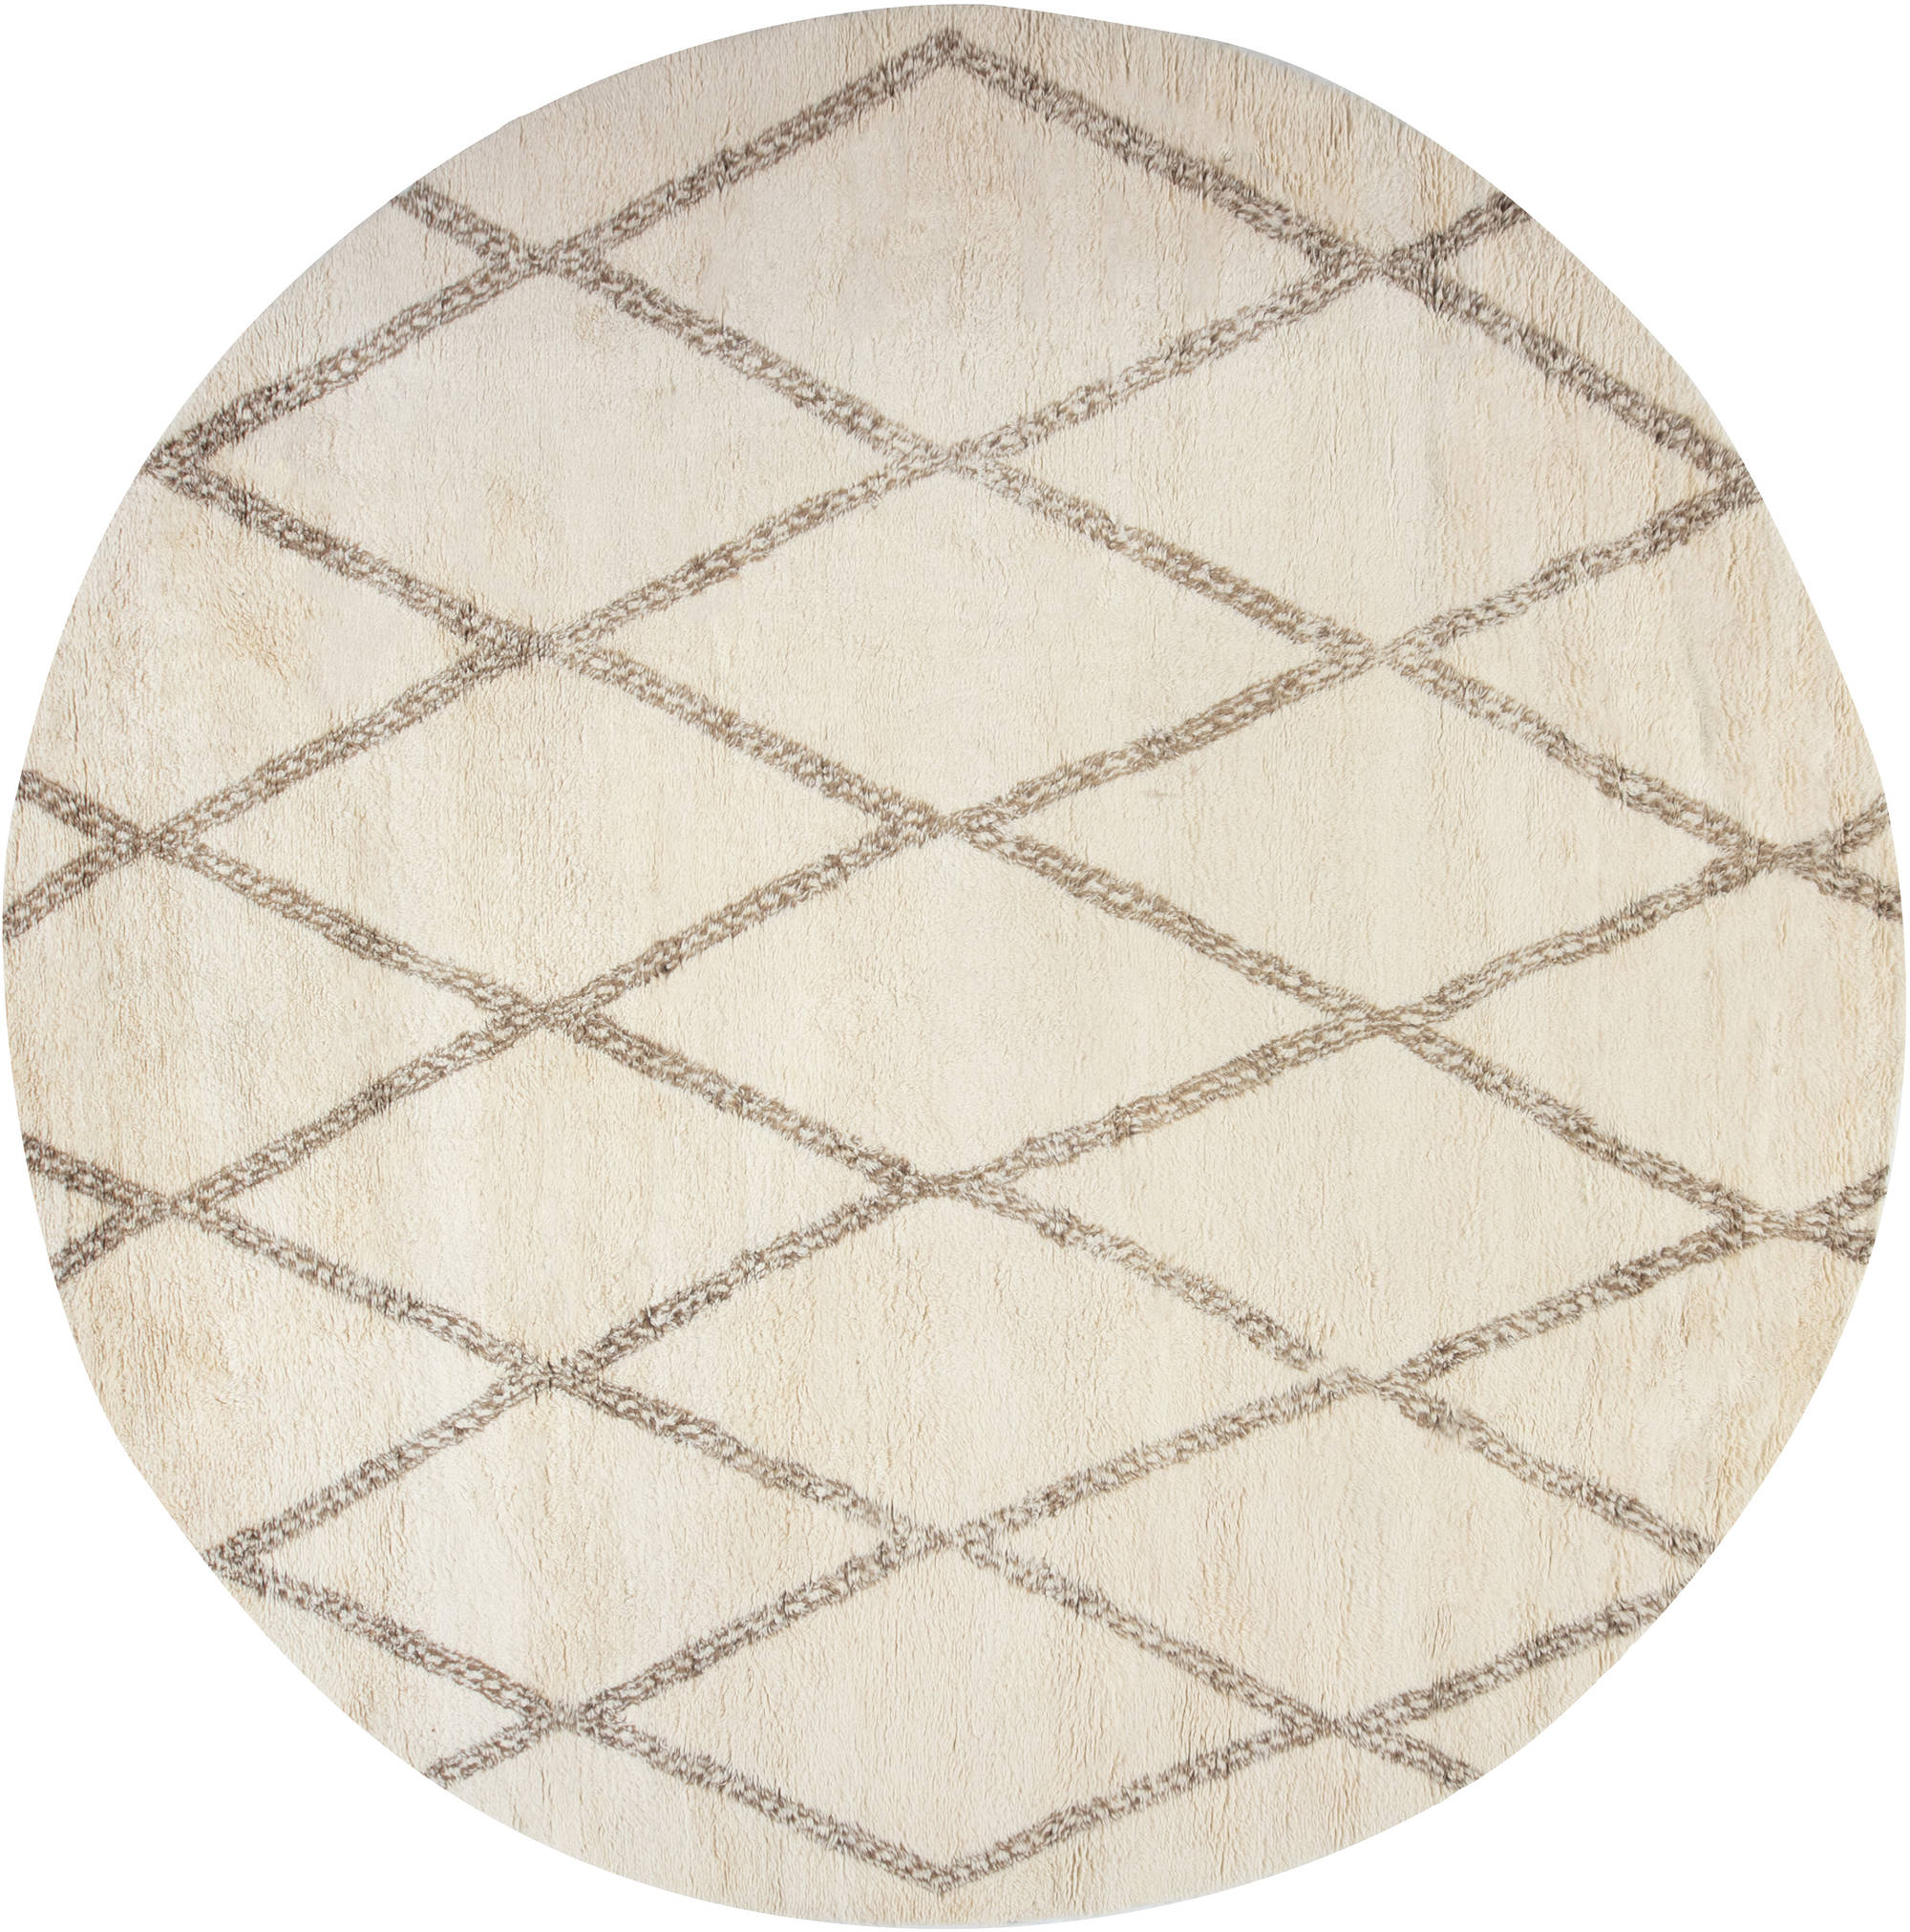 New Circular Moroccan rug N12022